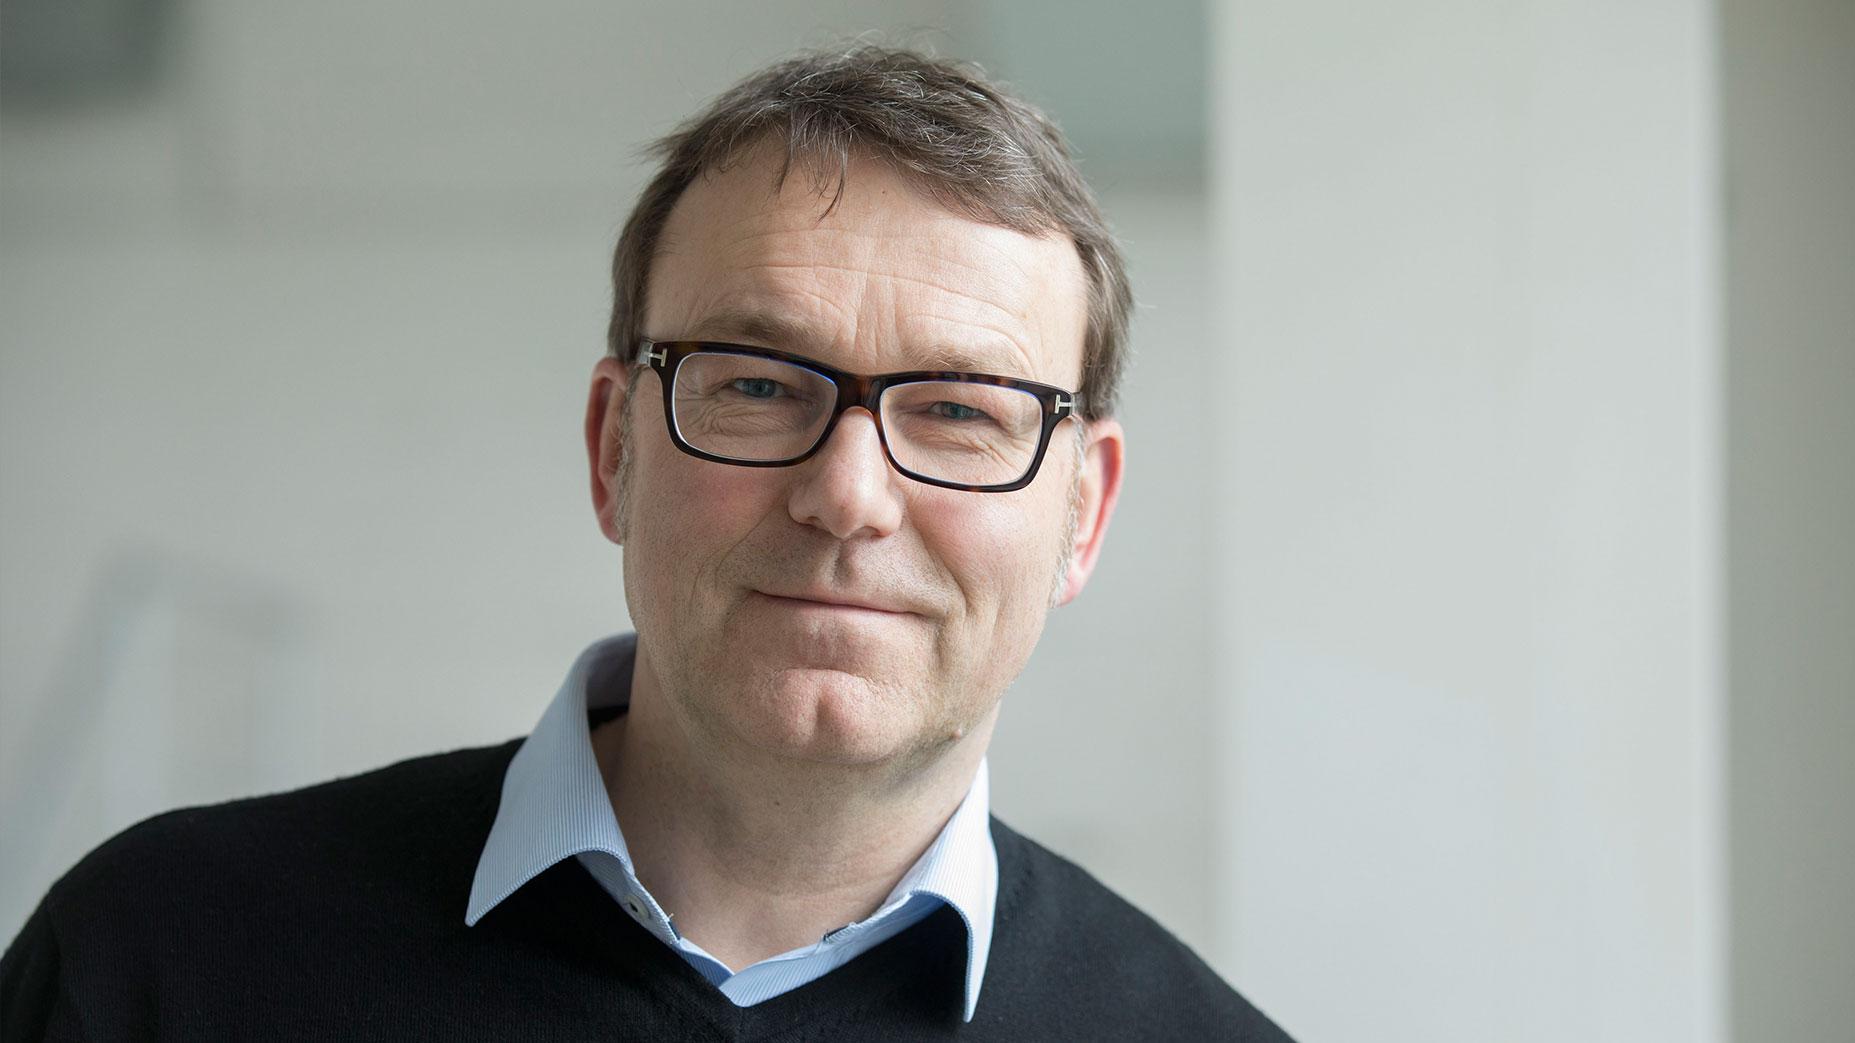 Torsten Gathmann (NDR/ Klaus Görgen)